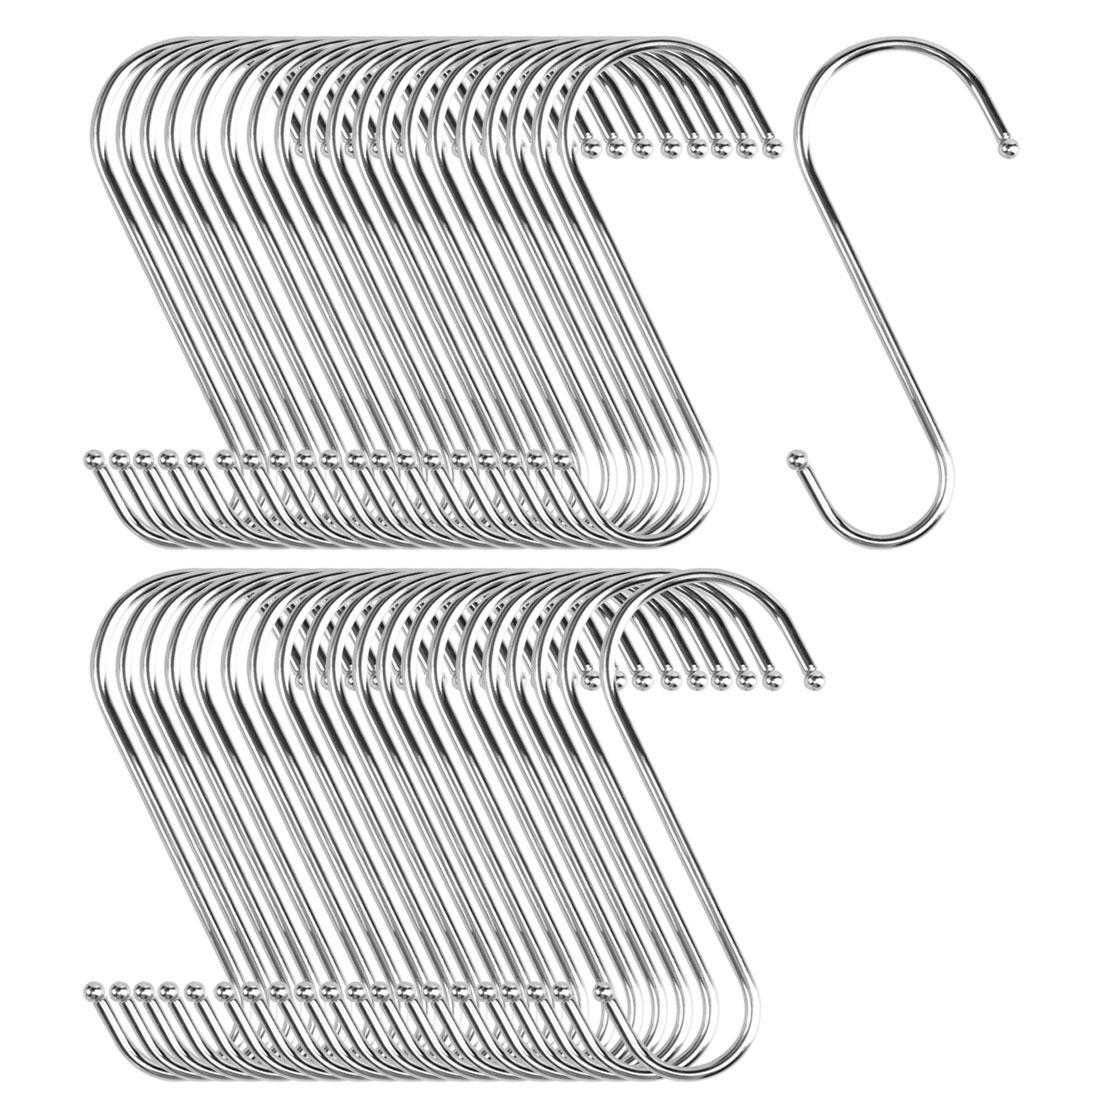 40pcs S Shaped Hook Stainless Steel Kitchenware Hat Utensil Pot Holder